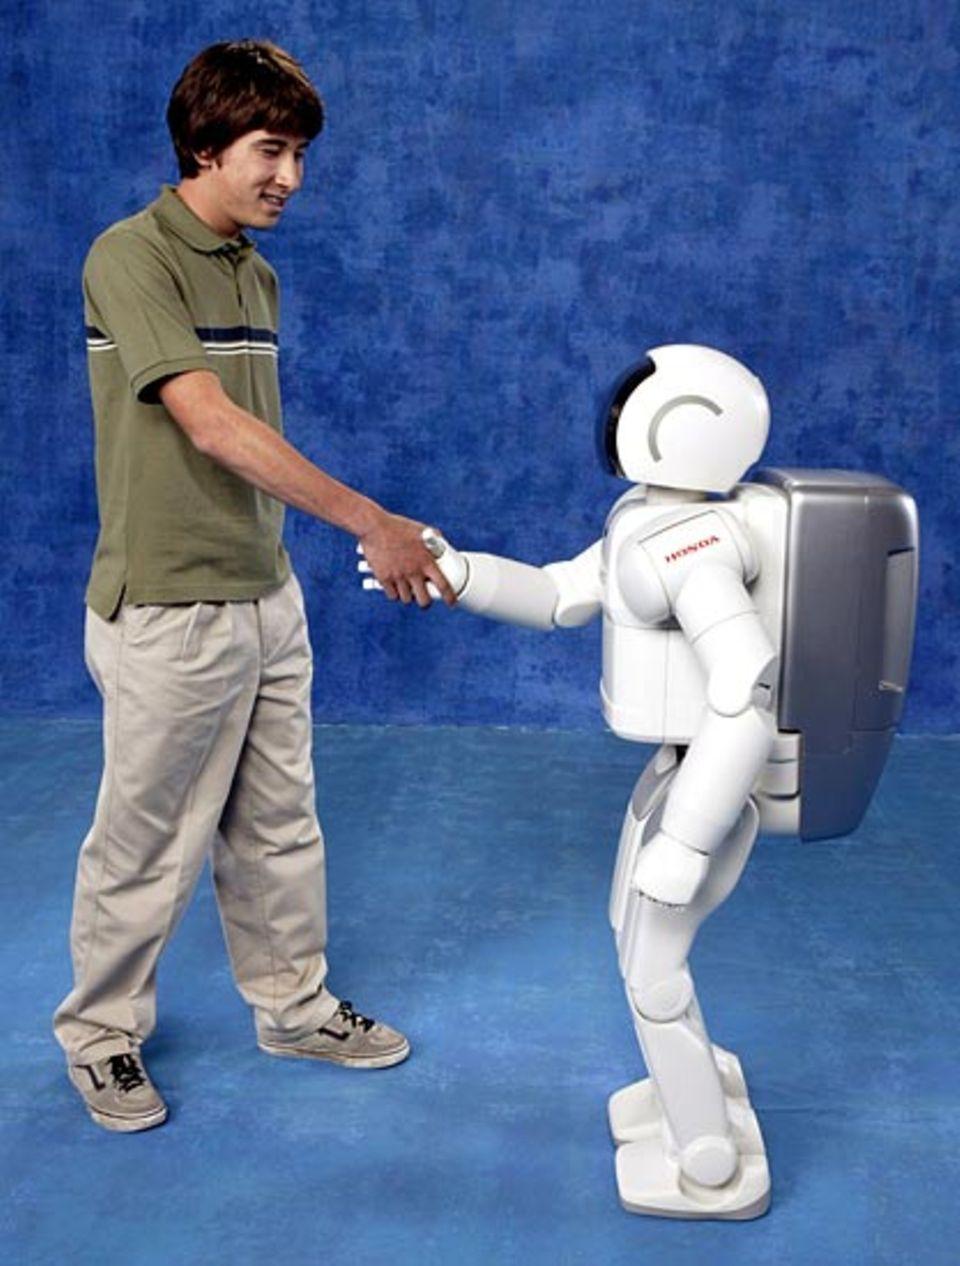 Technik: Asimo kann sogar richtigen Menschen die Hand schütteln